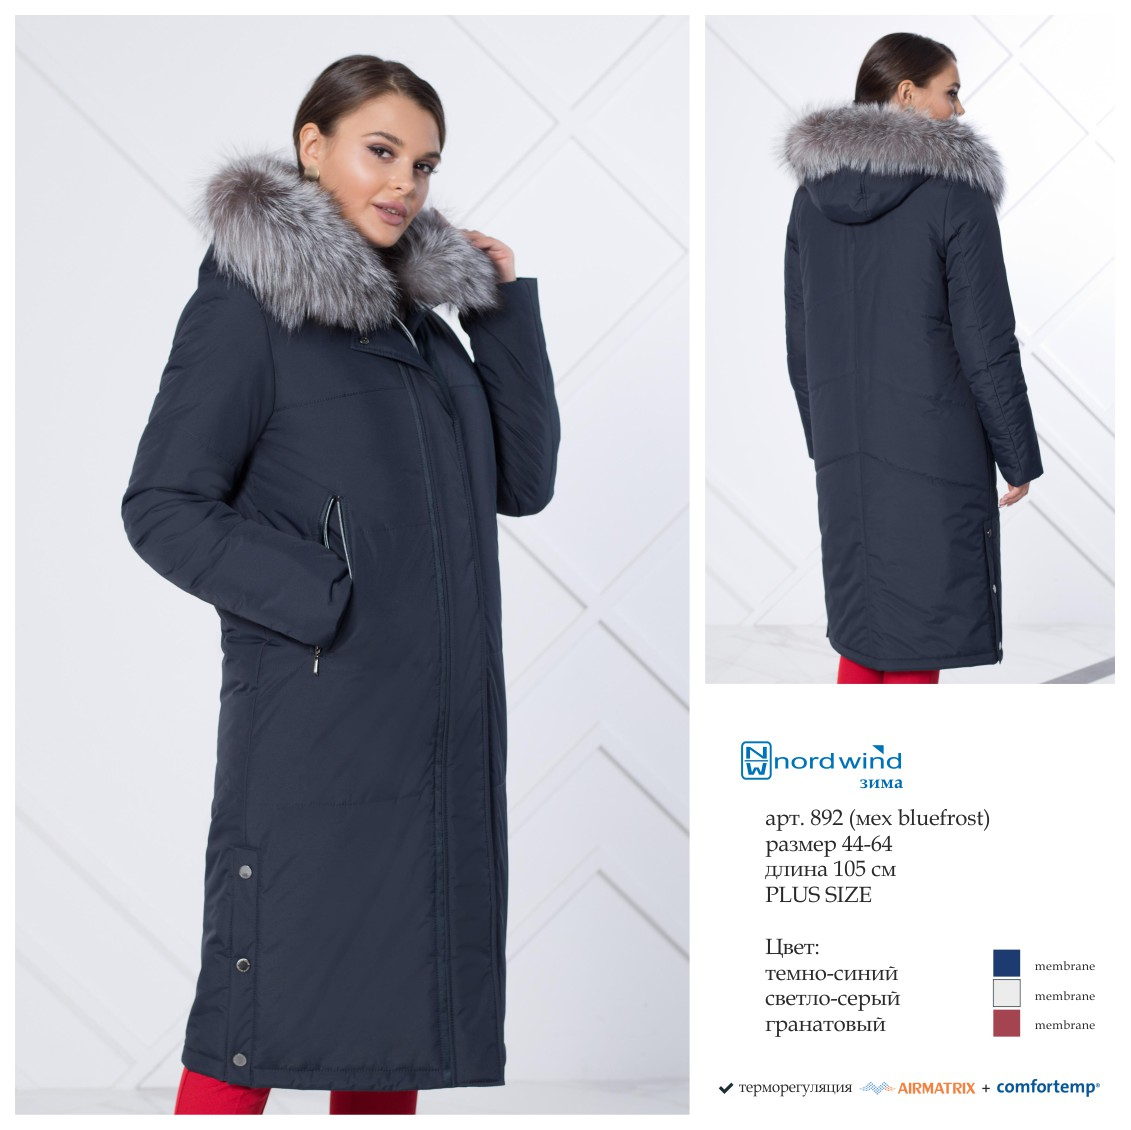 Пальто женское зима 892 Nord Wind — фото 1